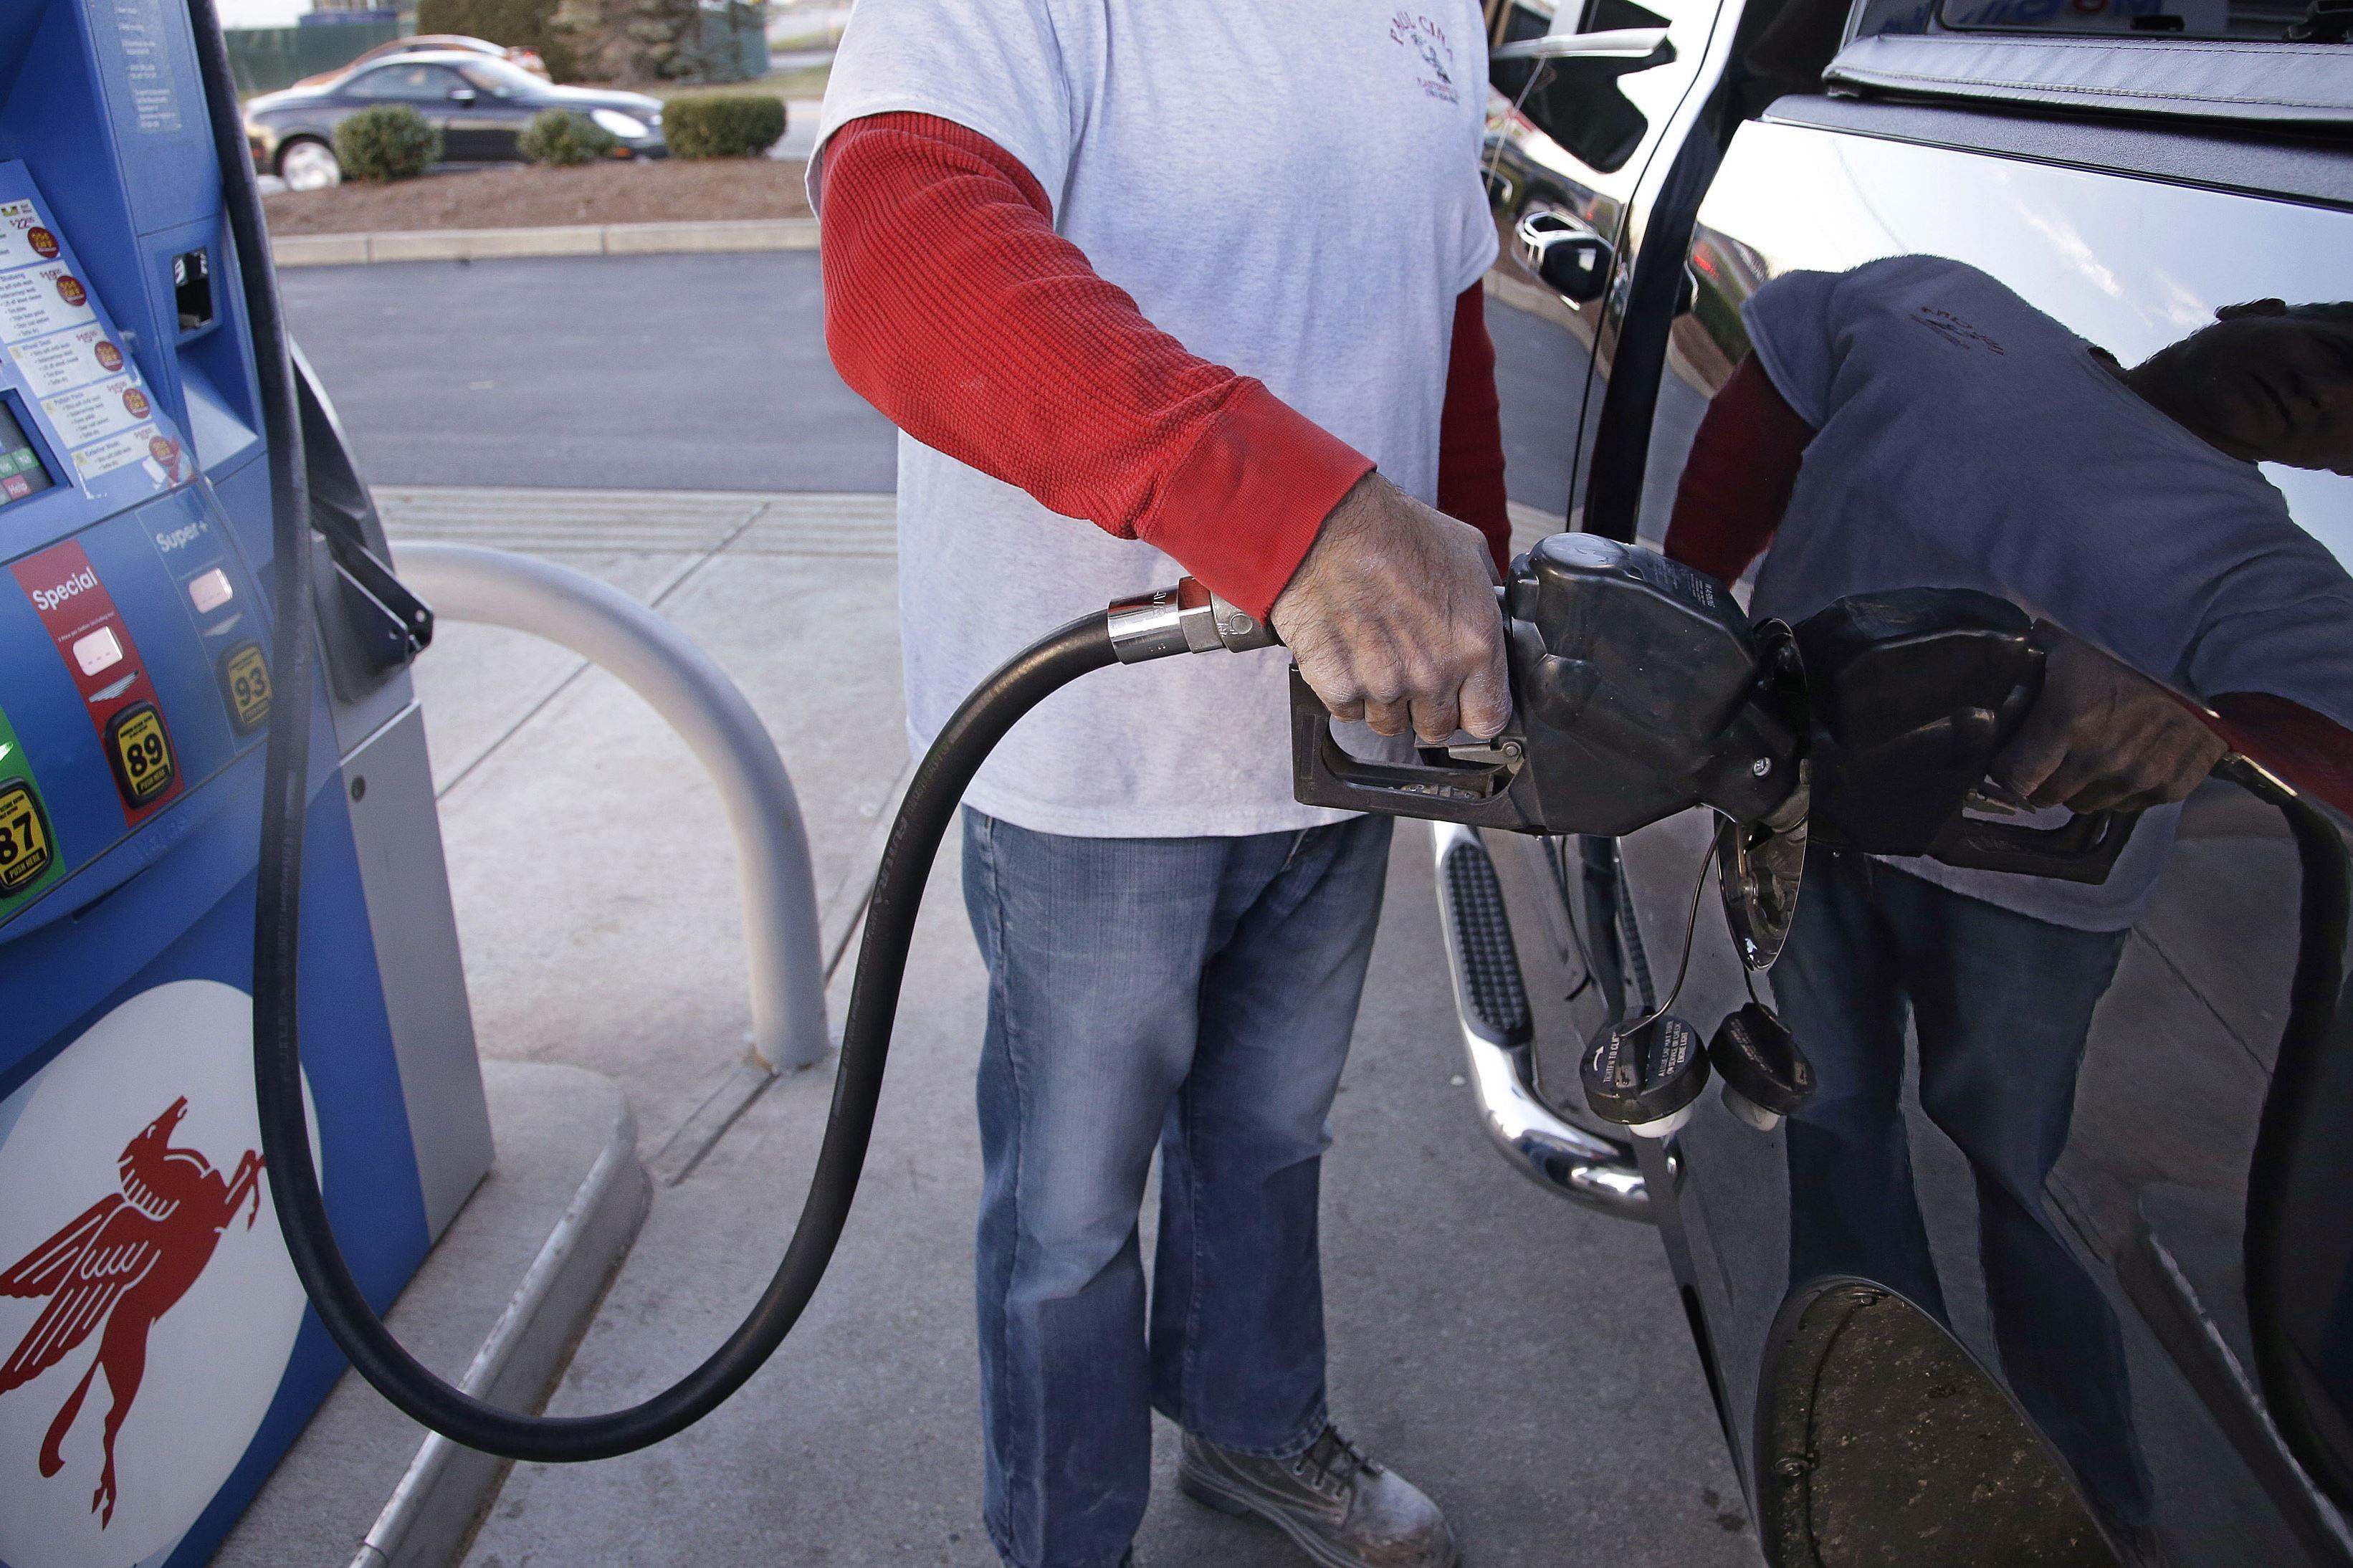 Average Houston gas price drops 1.6 cents